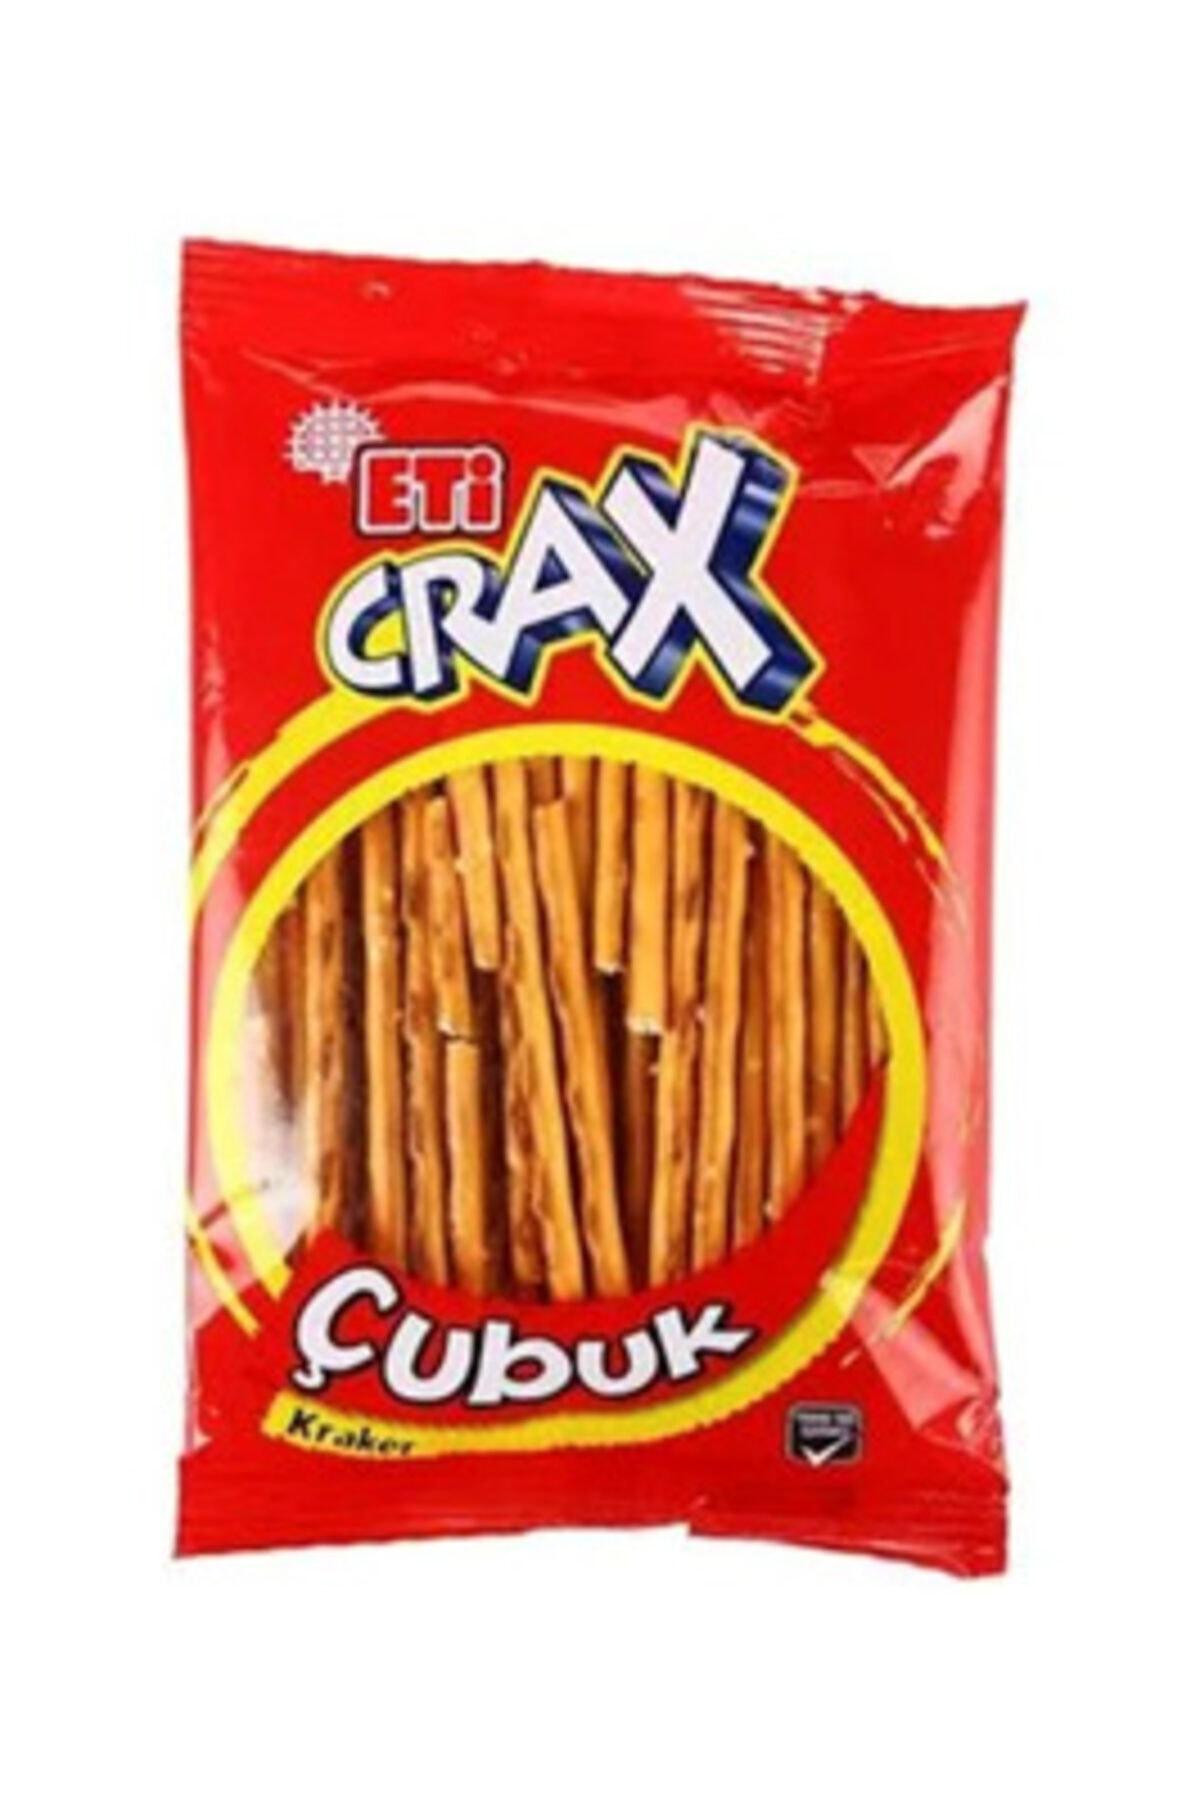 ETI CRAX CUBUK 40 GR